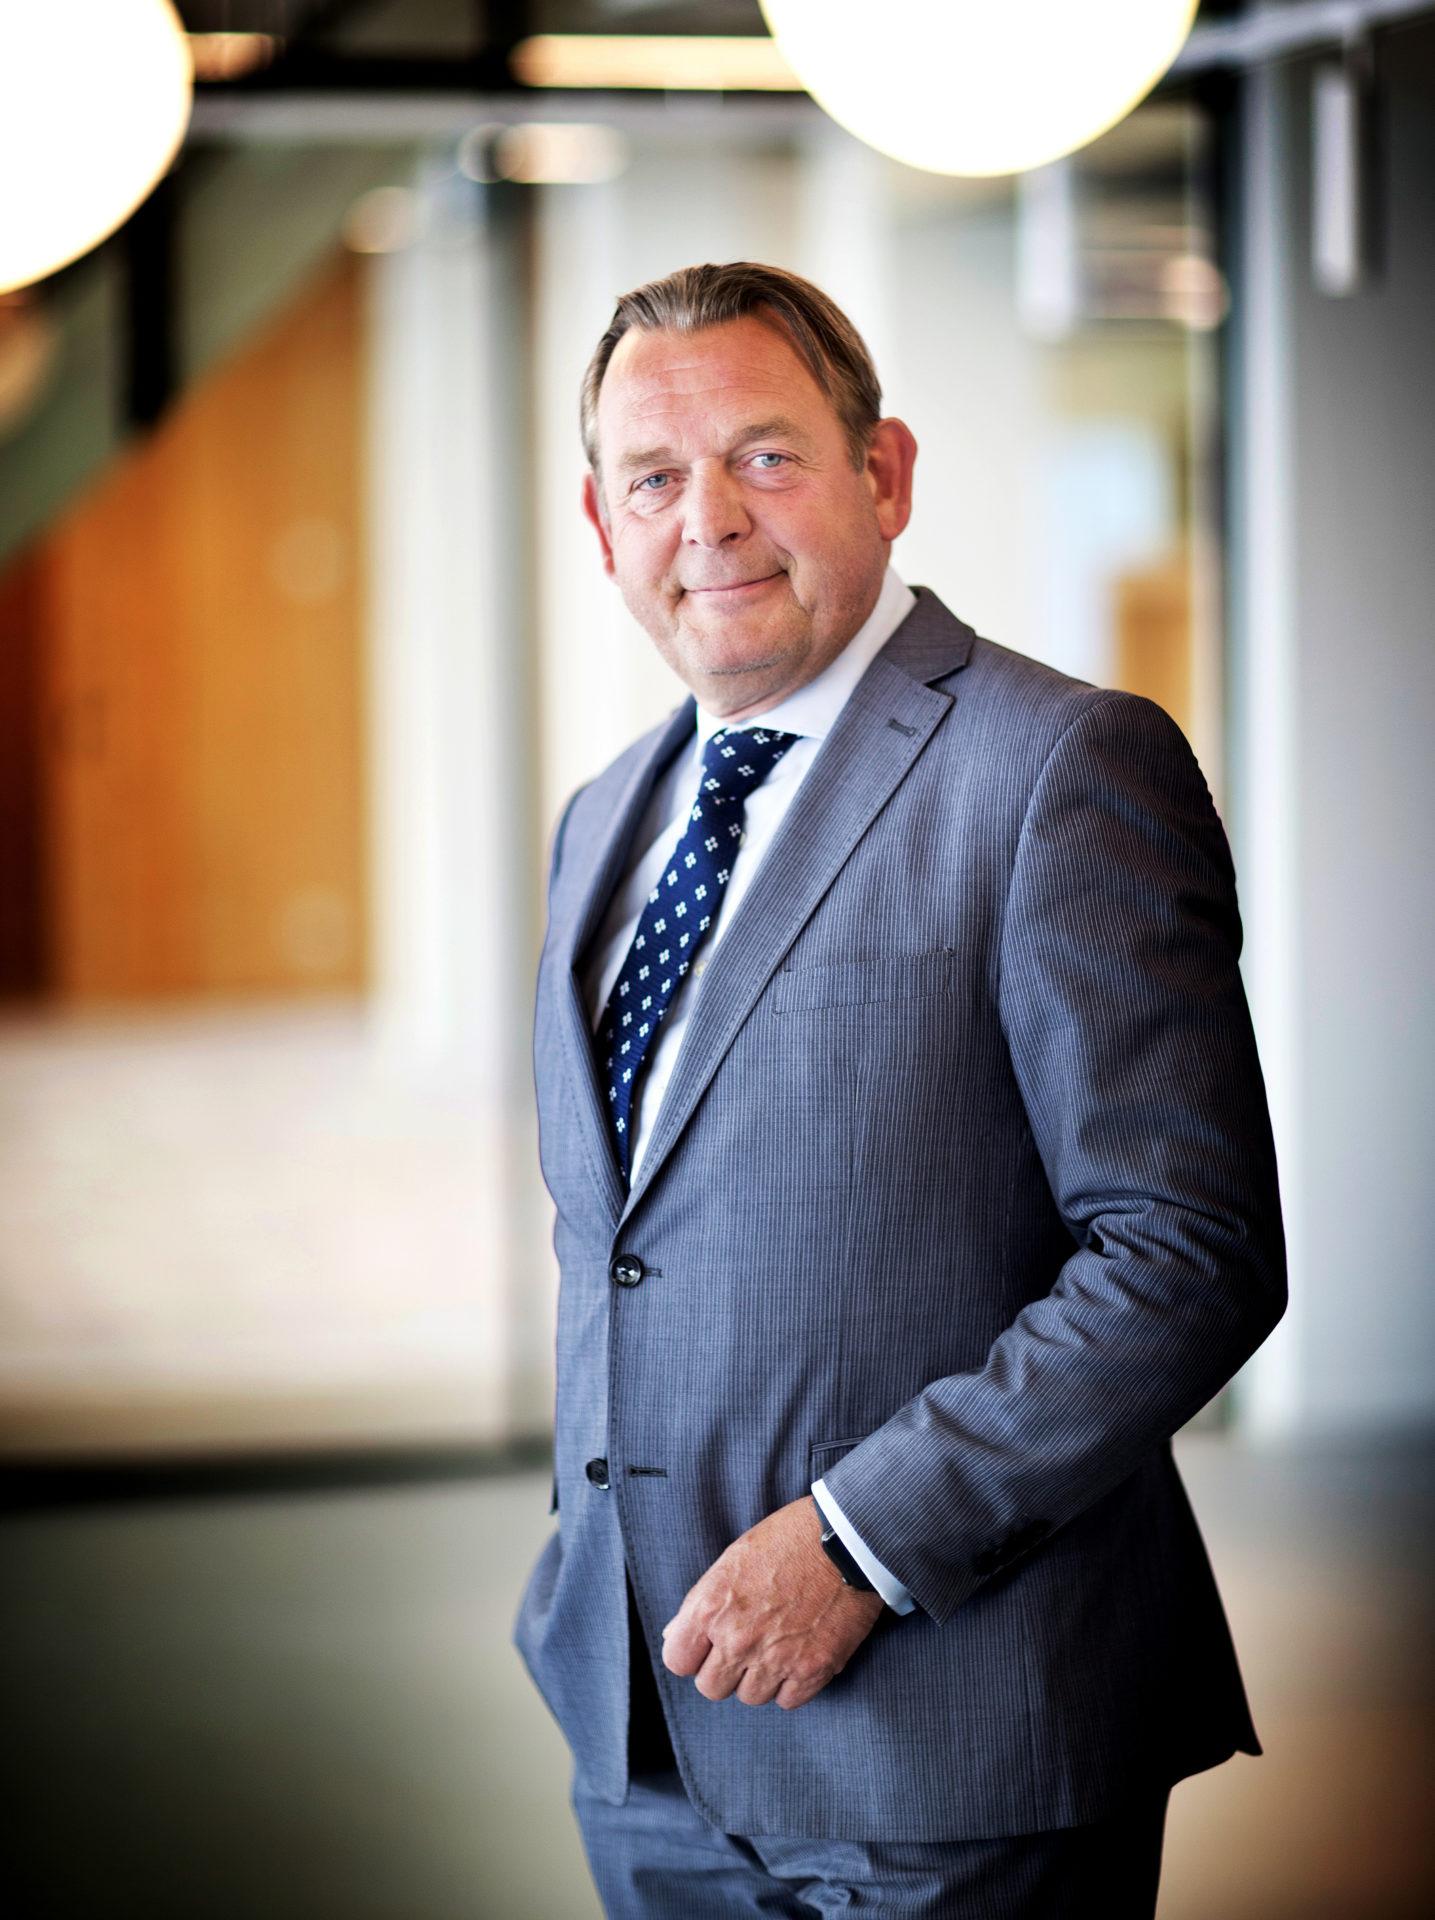 Ombudsman Mr. Reinier Franciscus Bernard van Zutphe